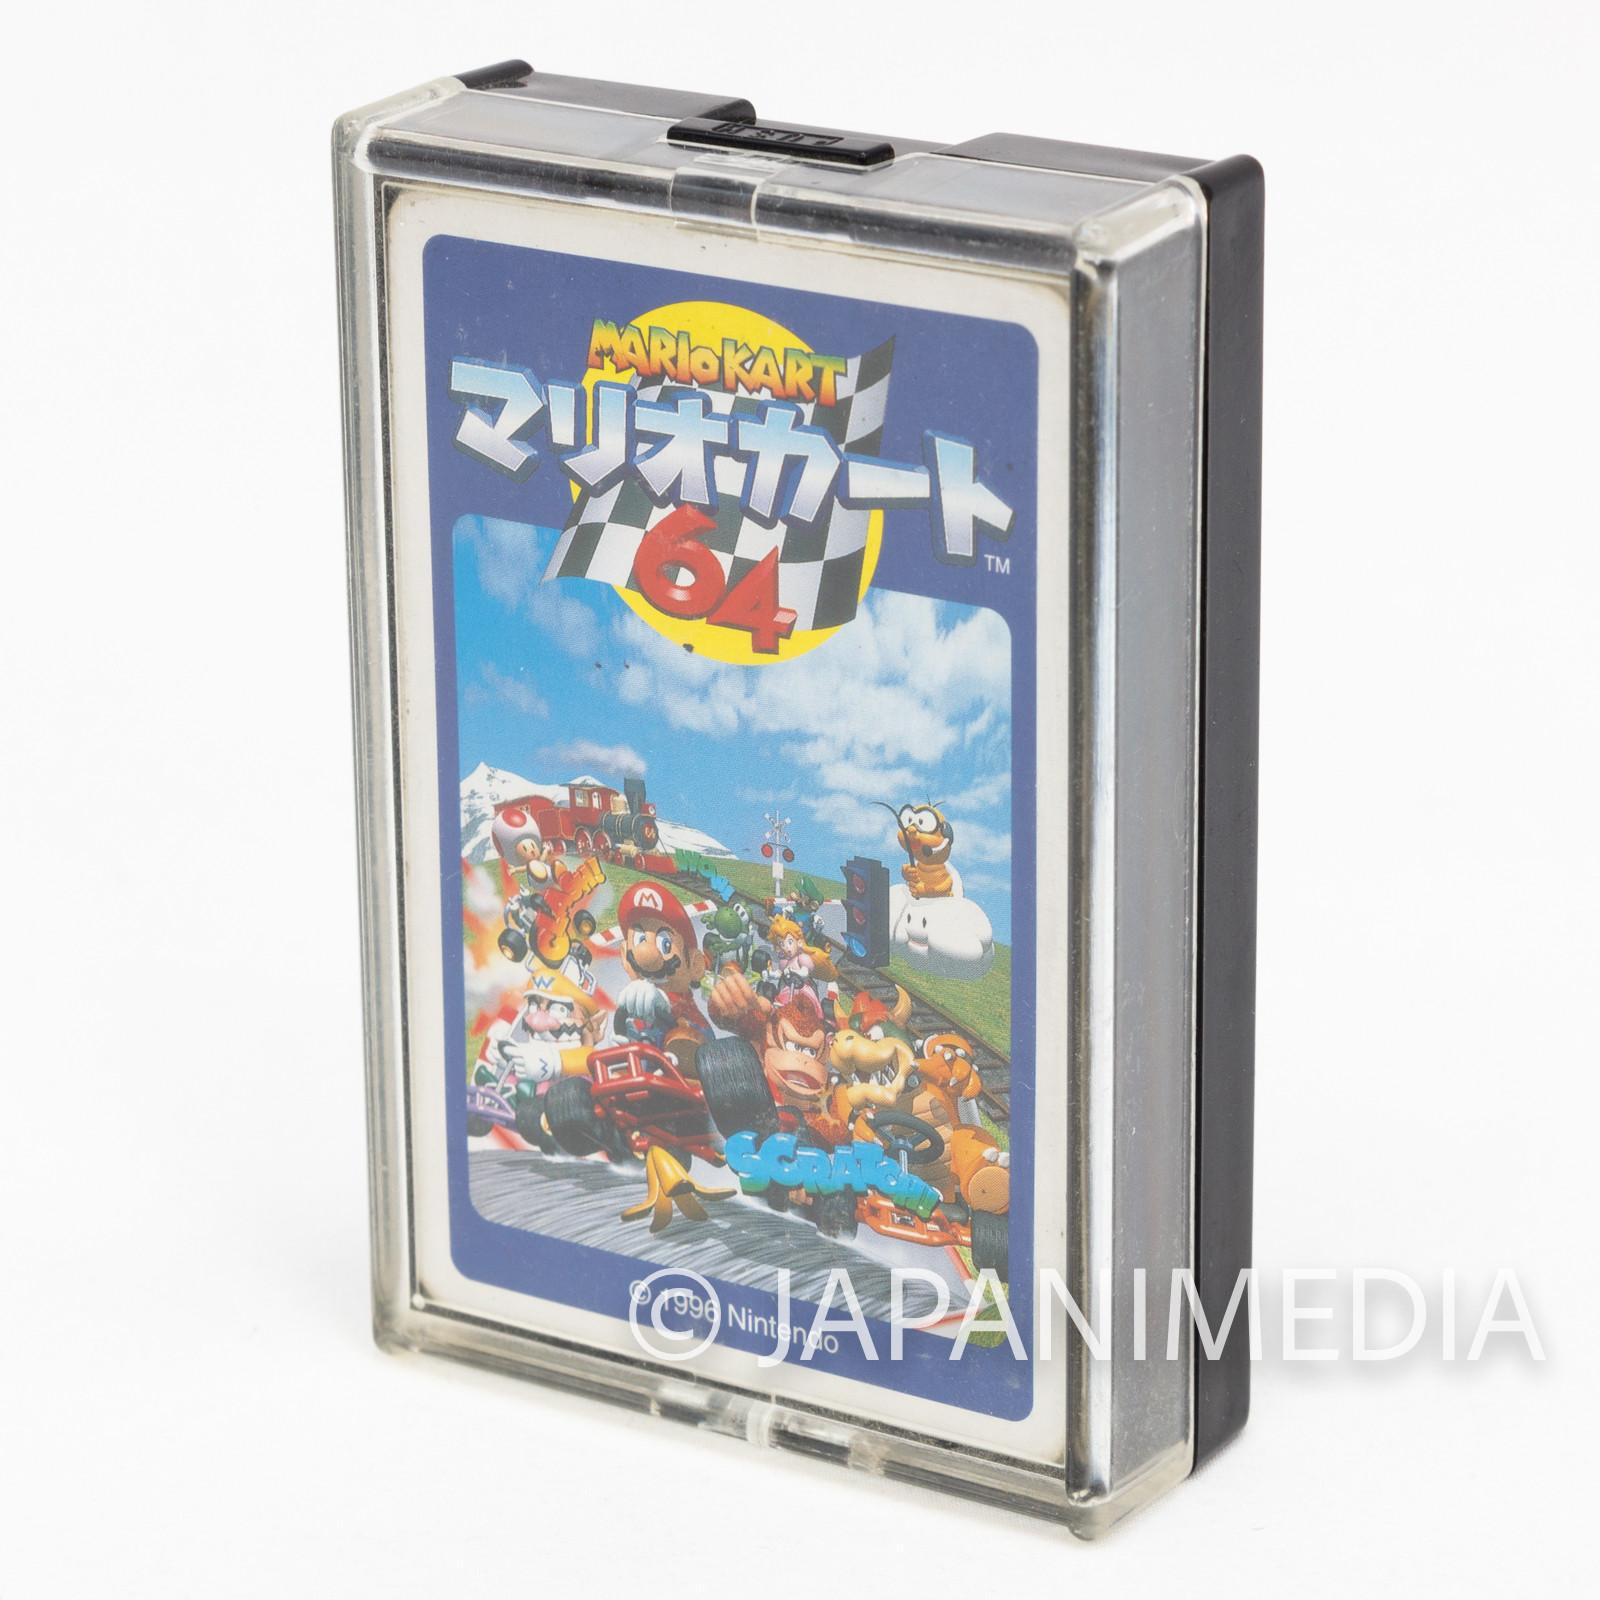 Retro RARE Mario Kart 64 Trump Playing Cards Nintendo JAPAN FAMICOM